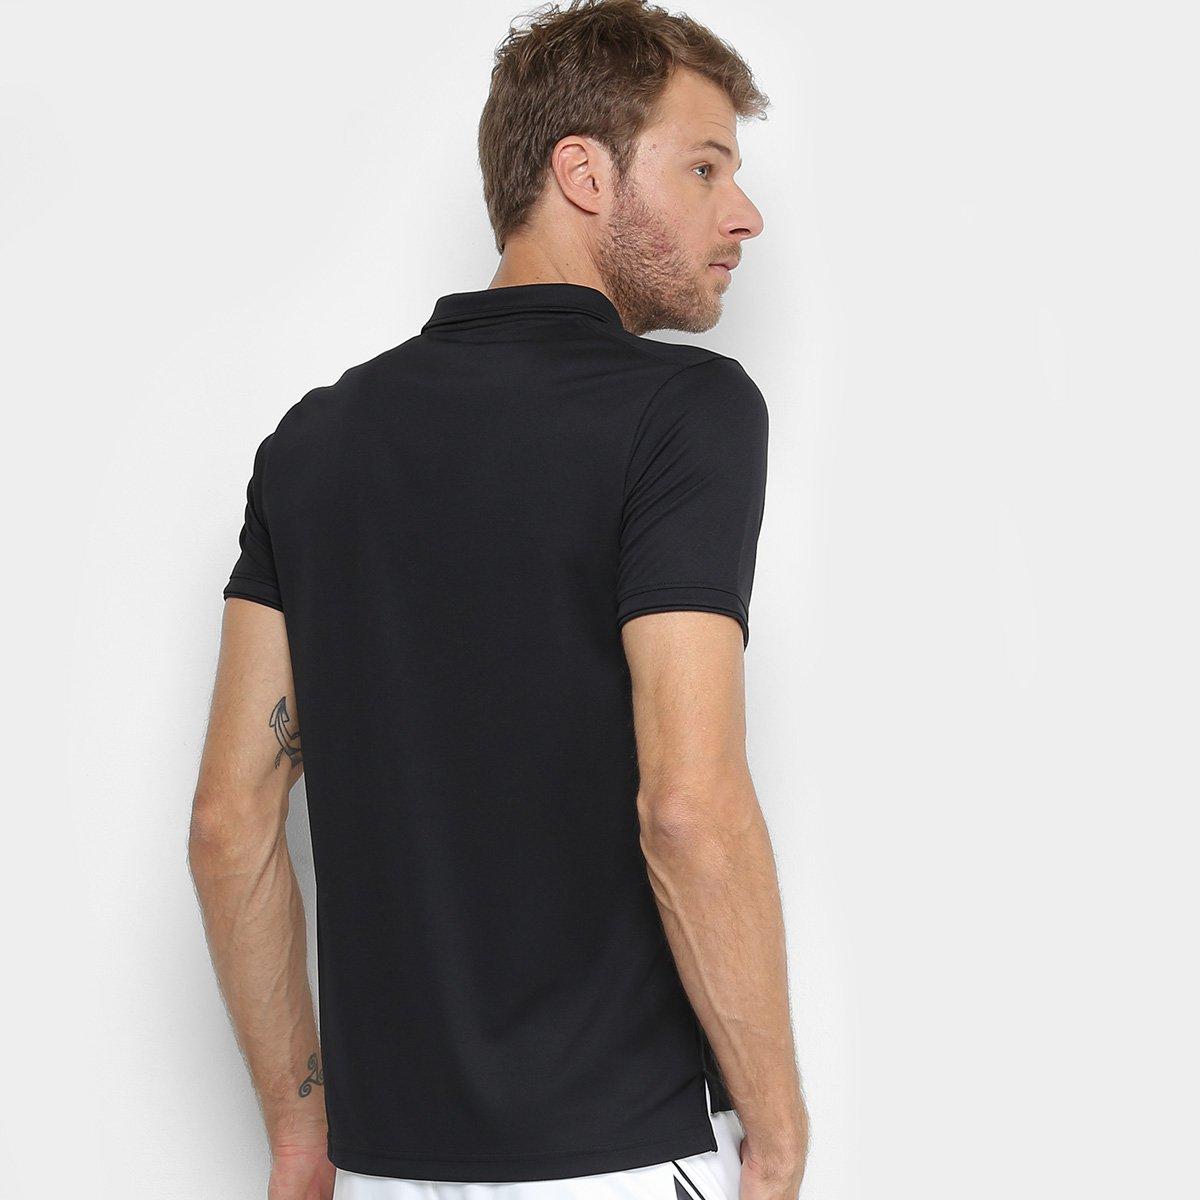 04f3ccb2e10 Camisa Polo Nike Dry Team Masculina - Tam  EGG - Shopping TudoAzul